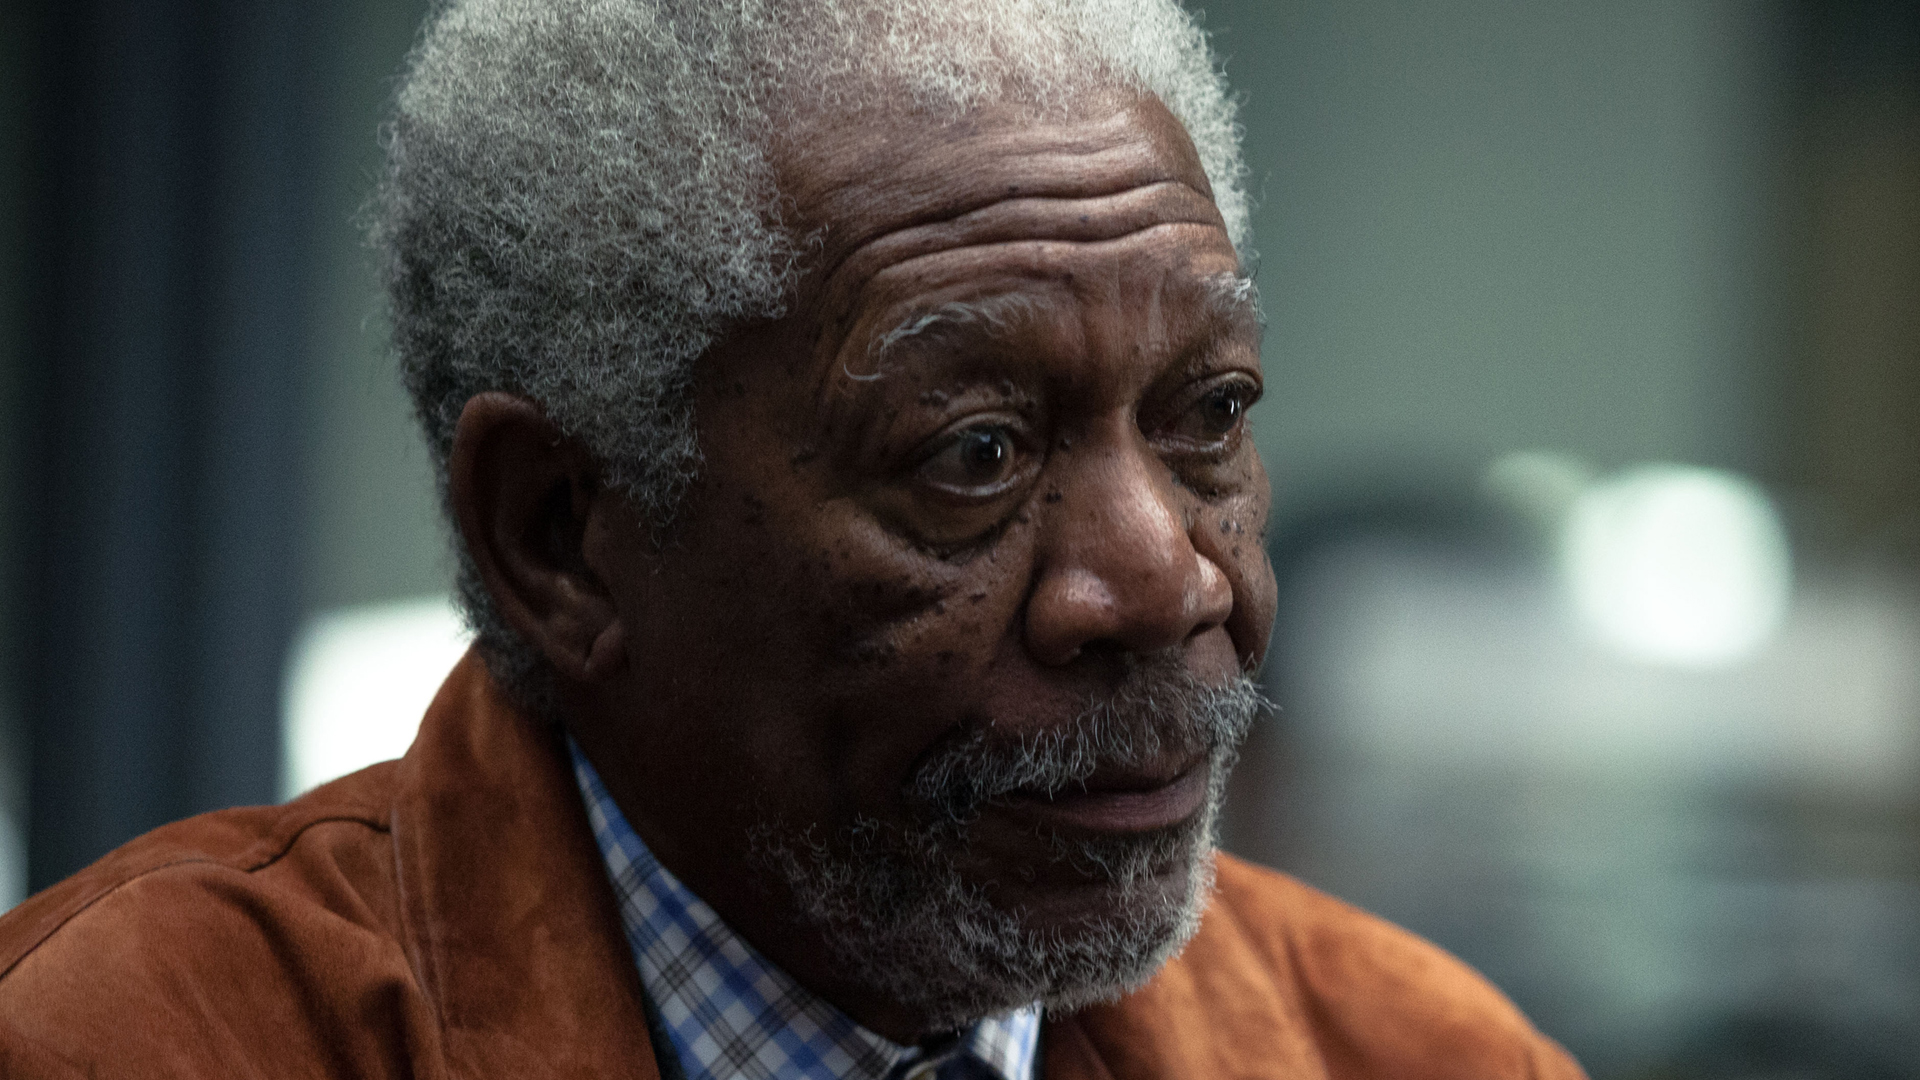 Morgan freeman movie president